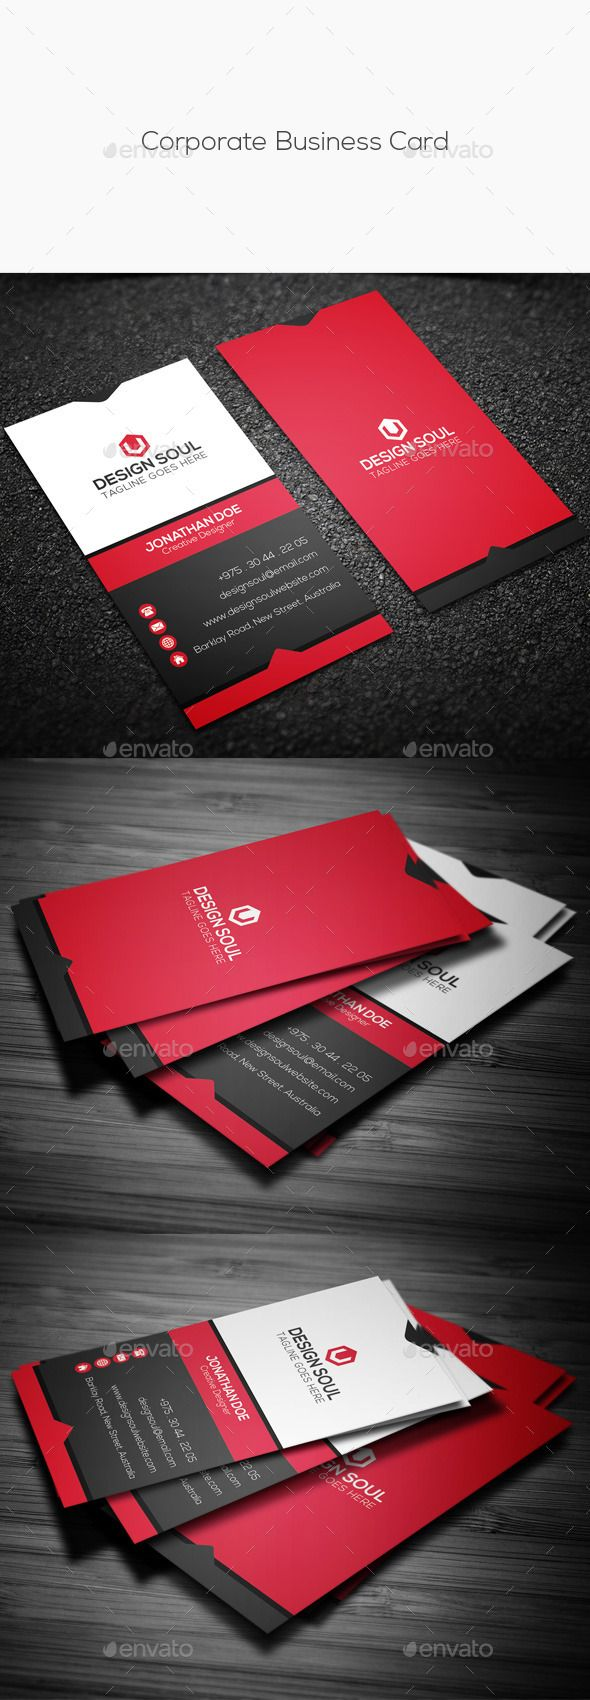 153 Best Business Cards Images On Pinterest Business Card Design